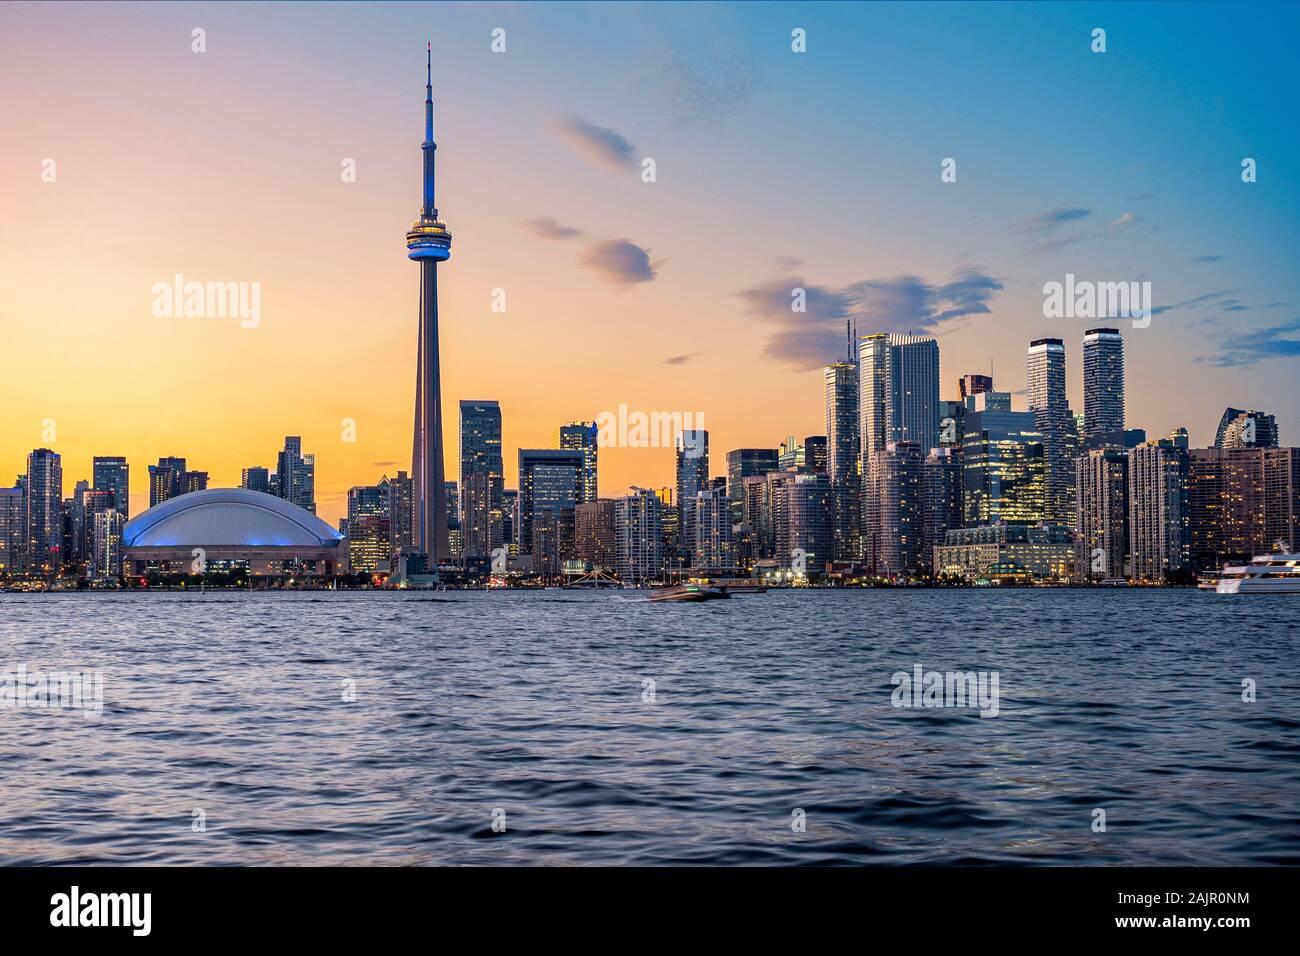 Toronto Skyline at sunset à Toronto, Ontario, Canada. Banque D'Images